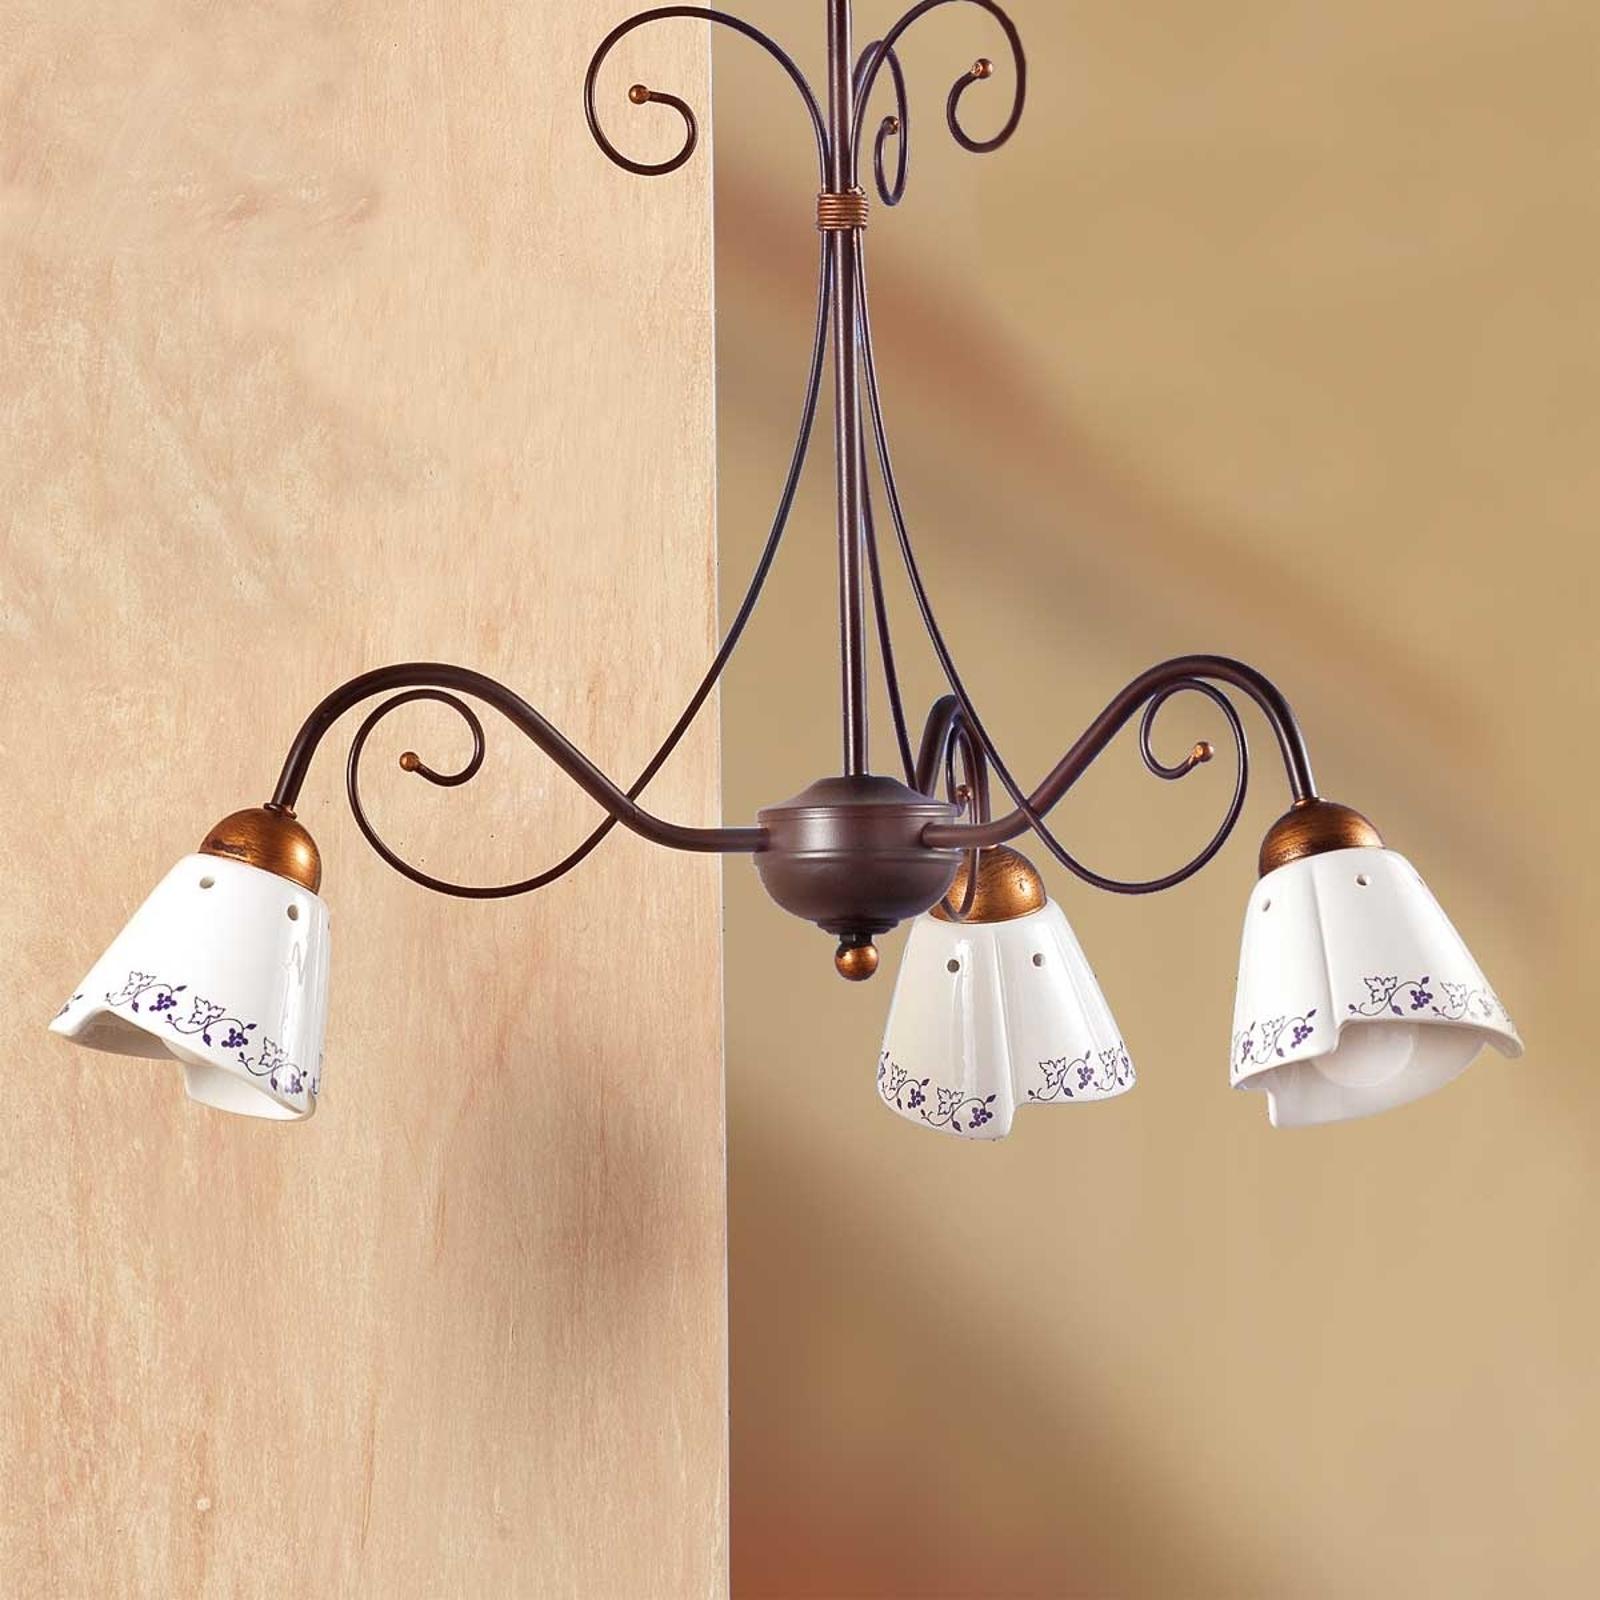 Klassisk CARTOCCIO hengelampe med tre lys